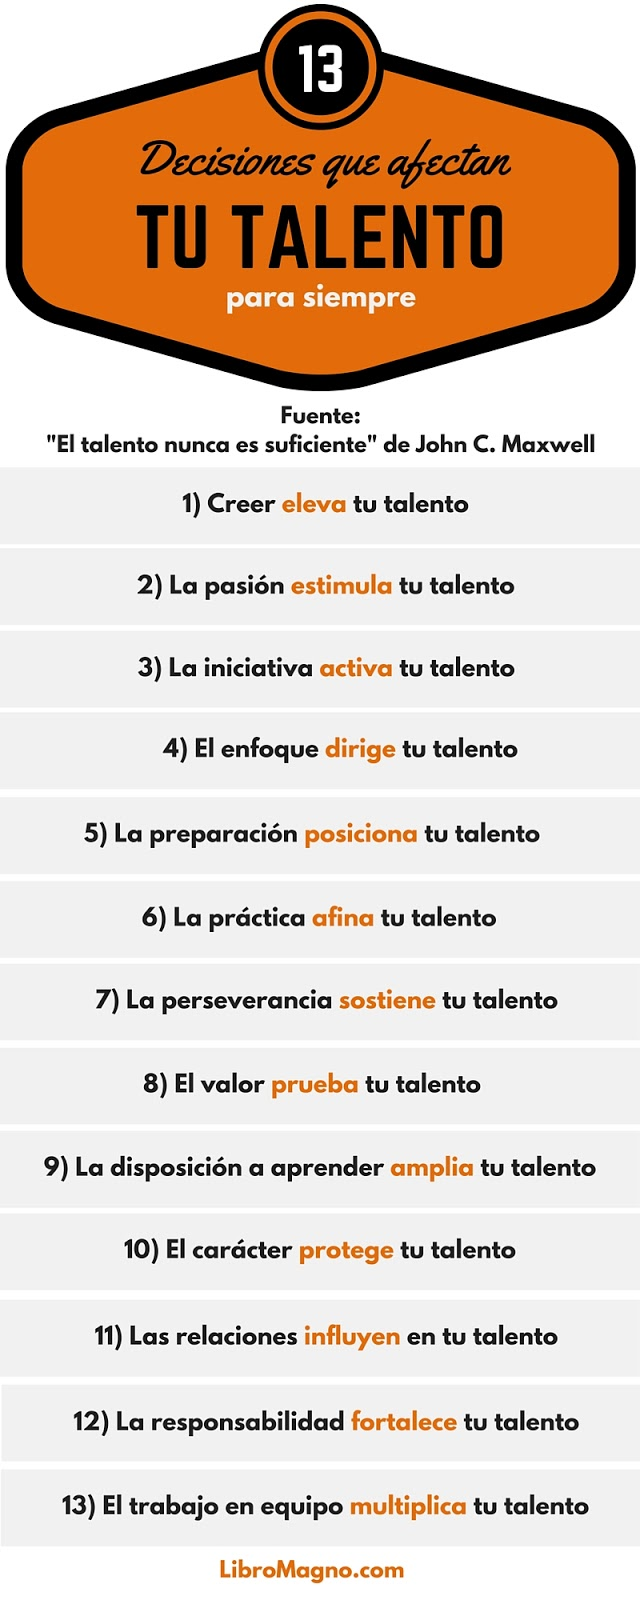 13 decisiones que afectan tu talento